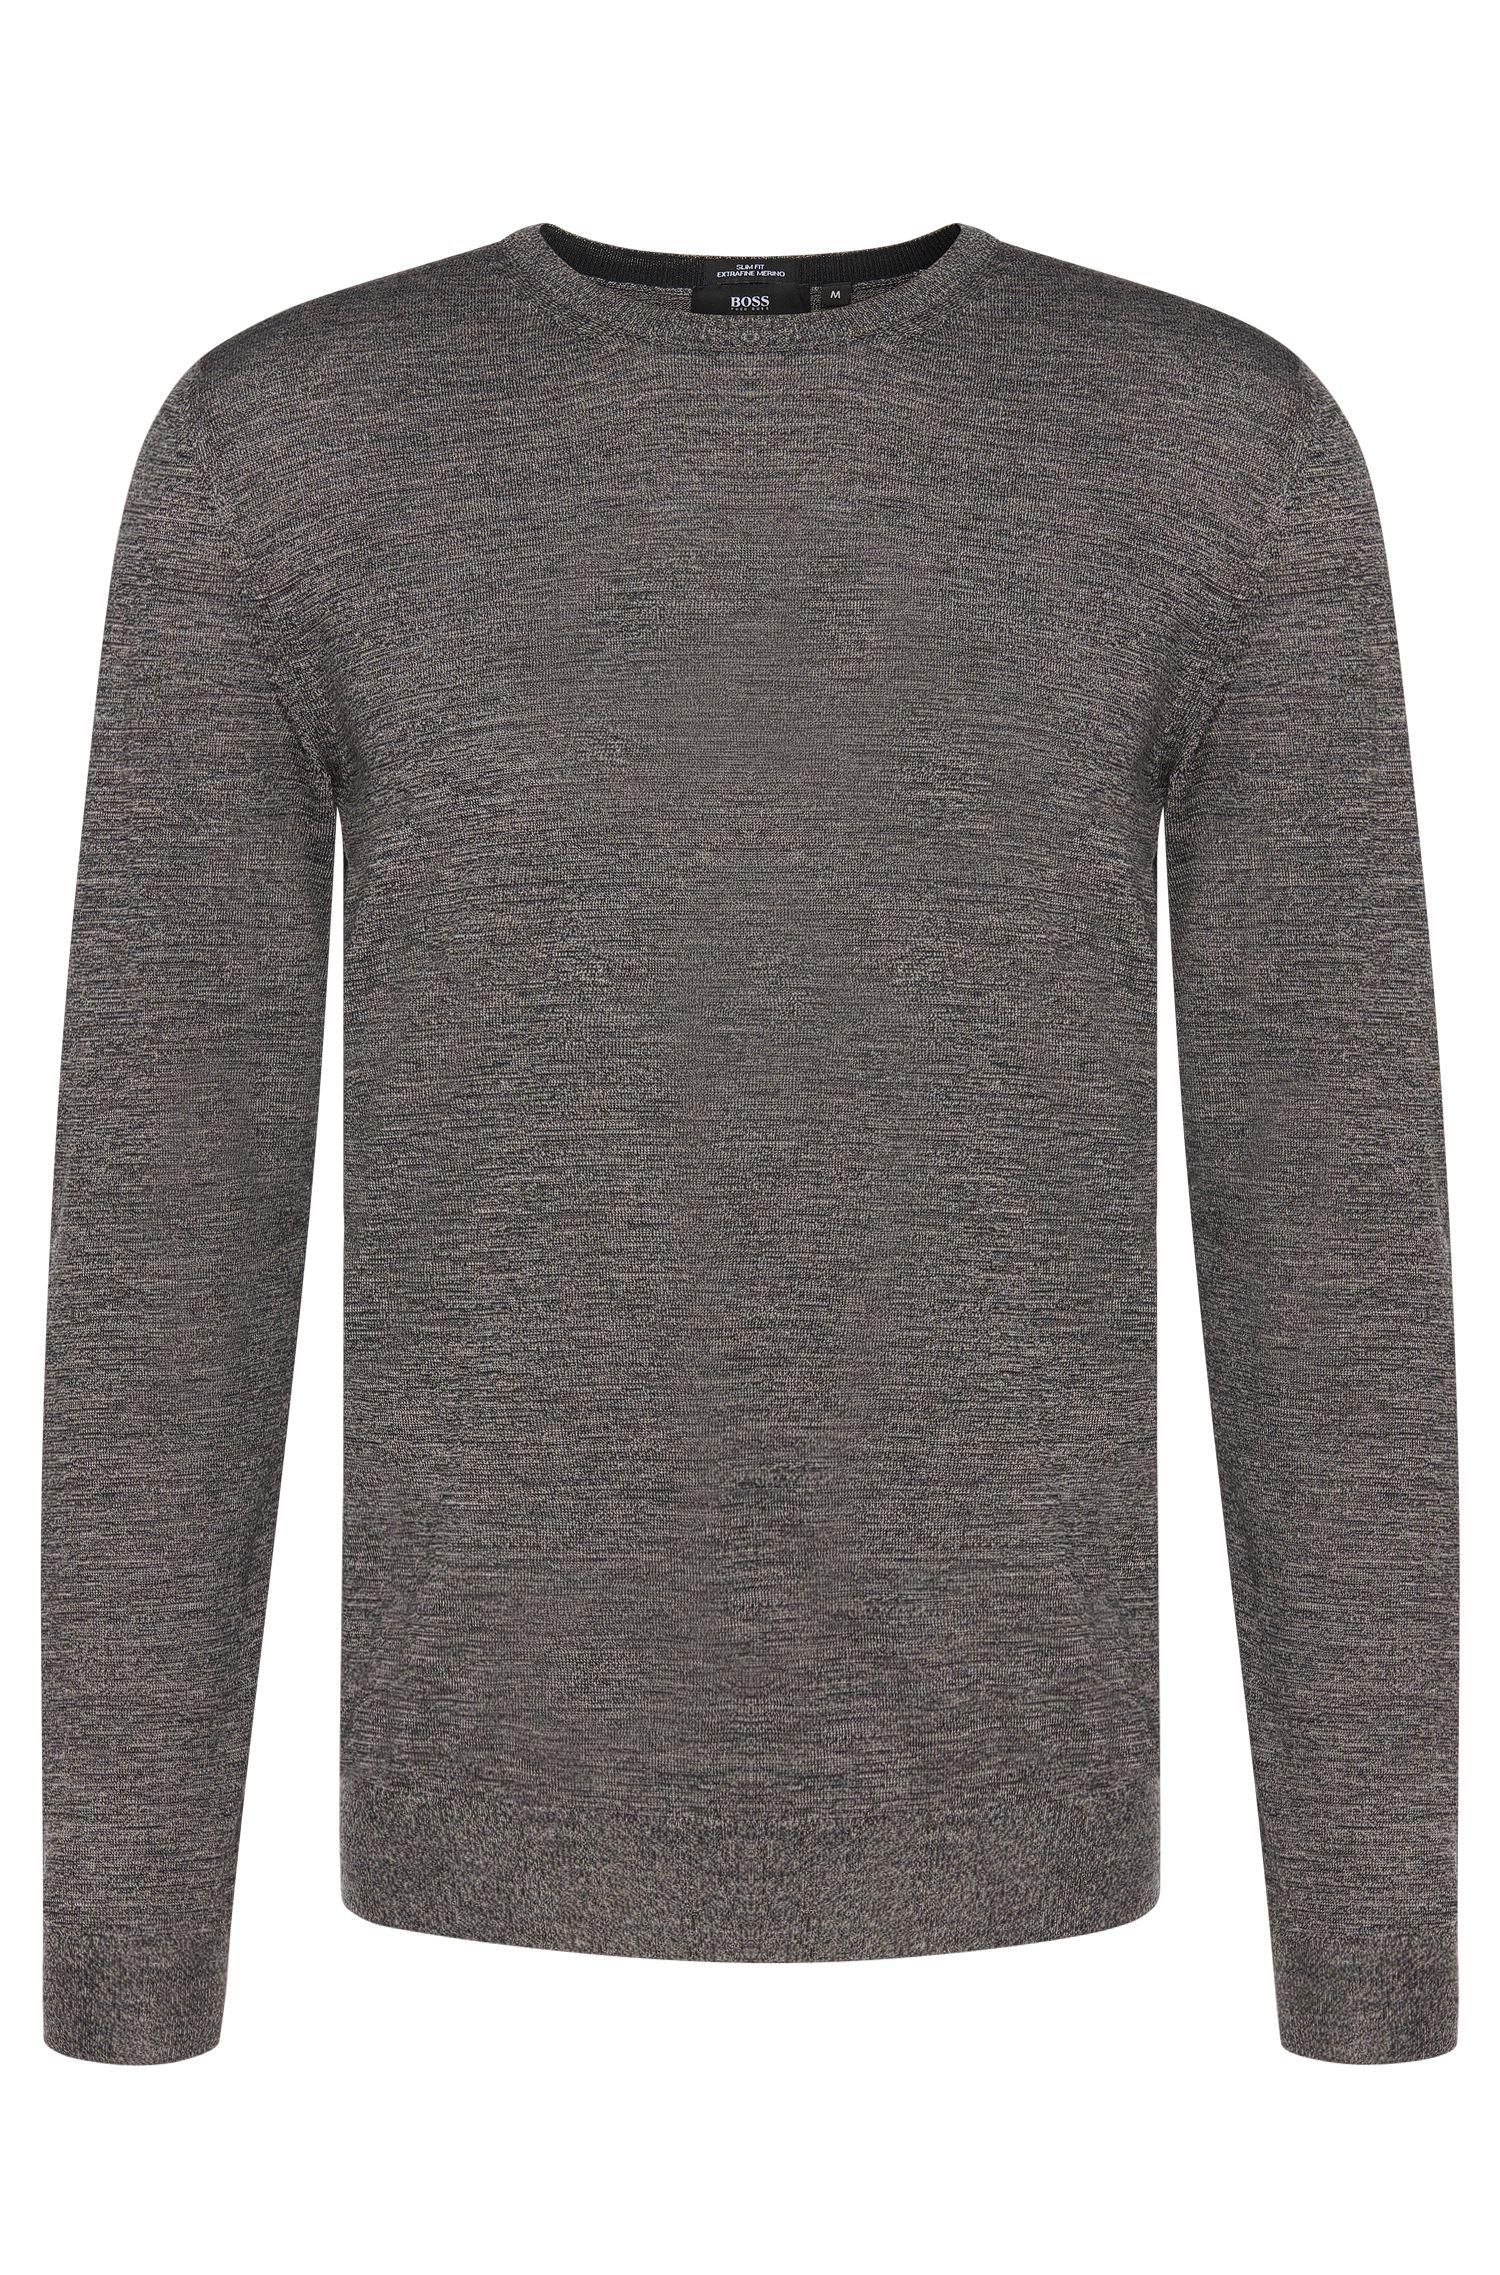 'Leno-B' | Merino Virgin Wool Sweater